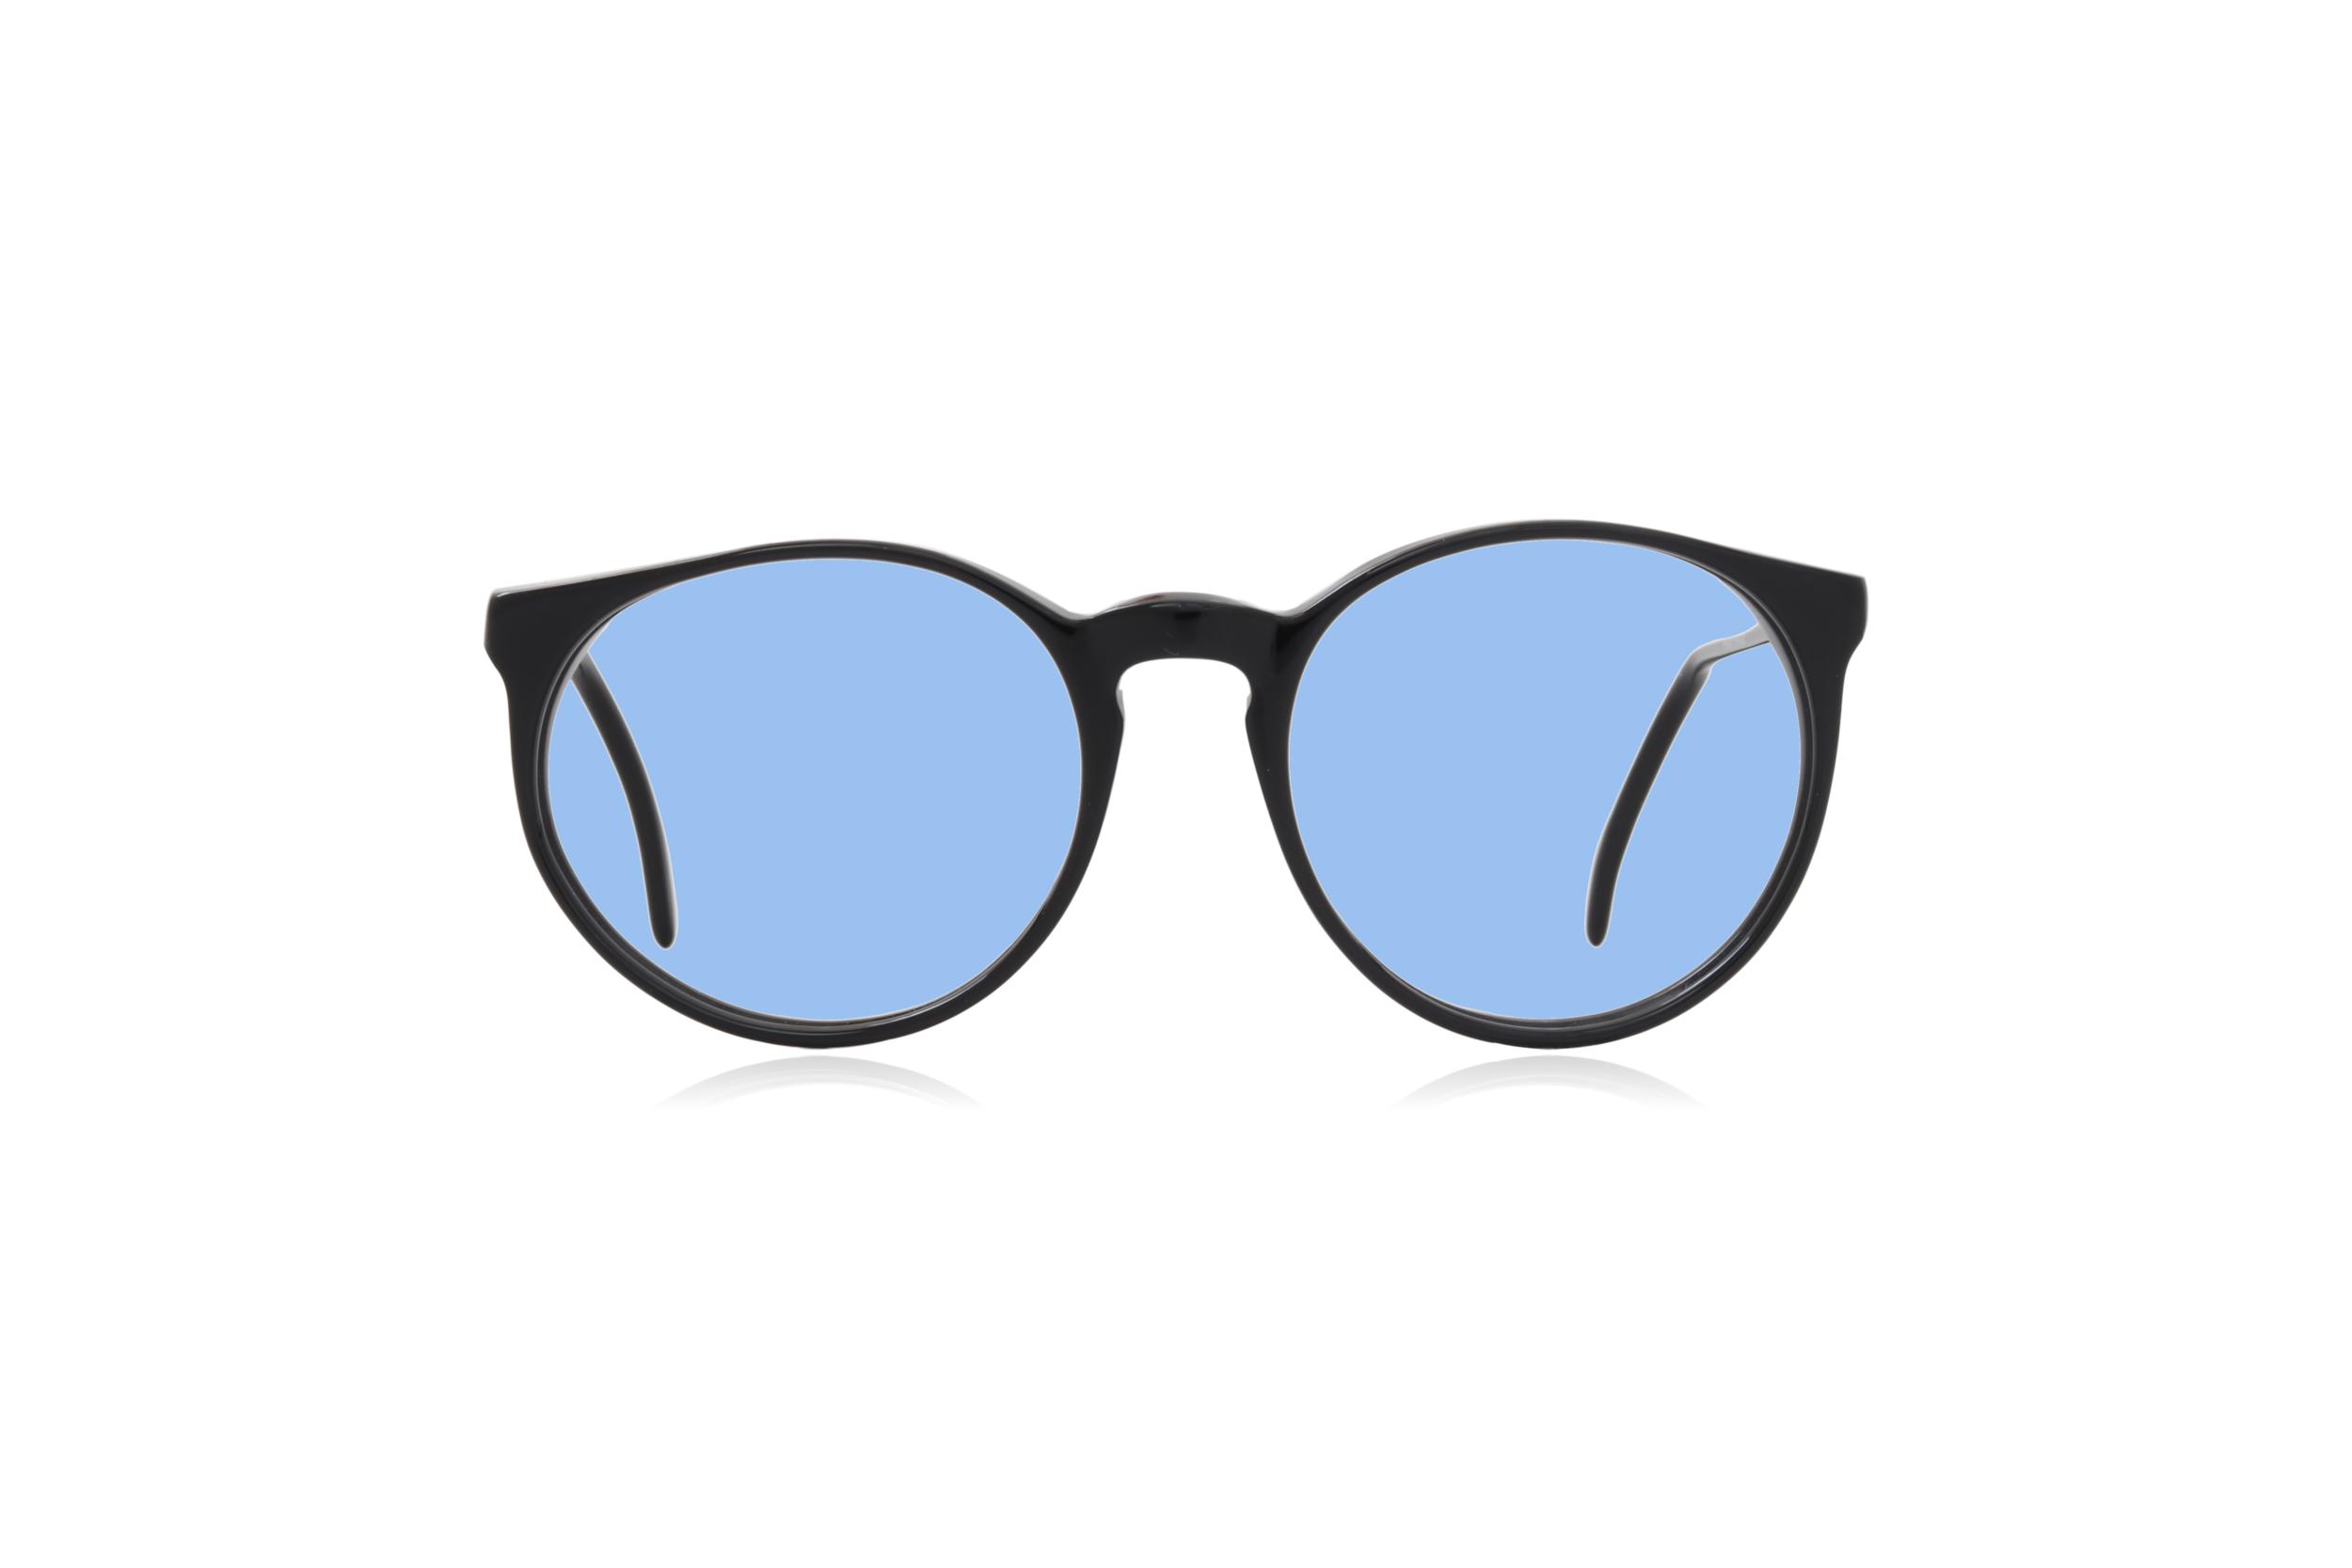 Peep Eyewear, Vintage Glasses, 1980s, Morel 2730, 1980s, Blue Lenses.png